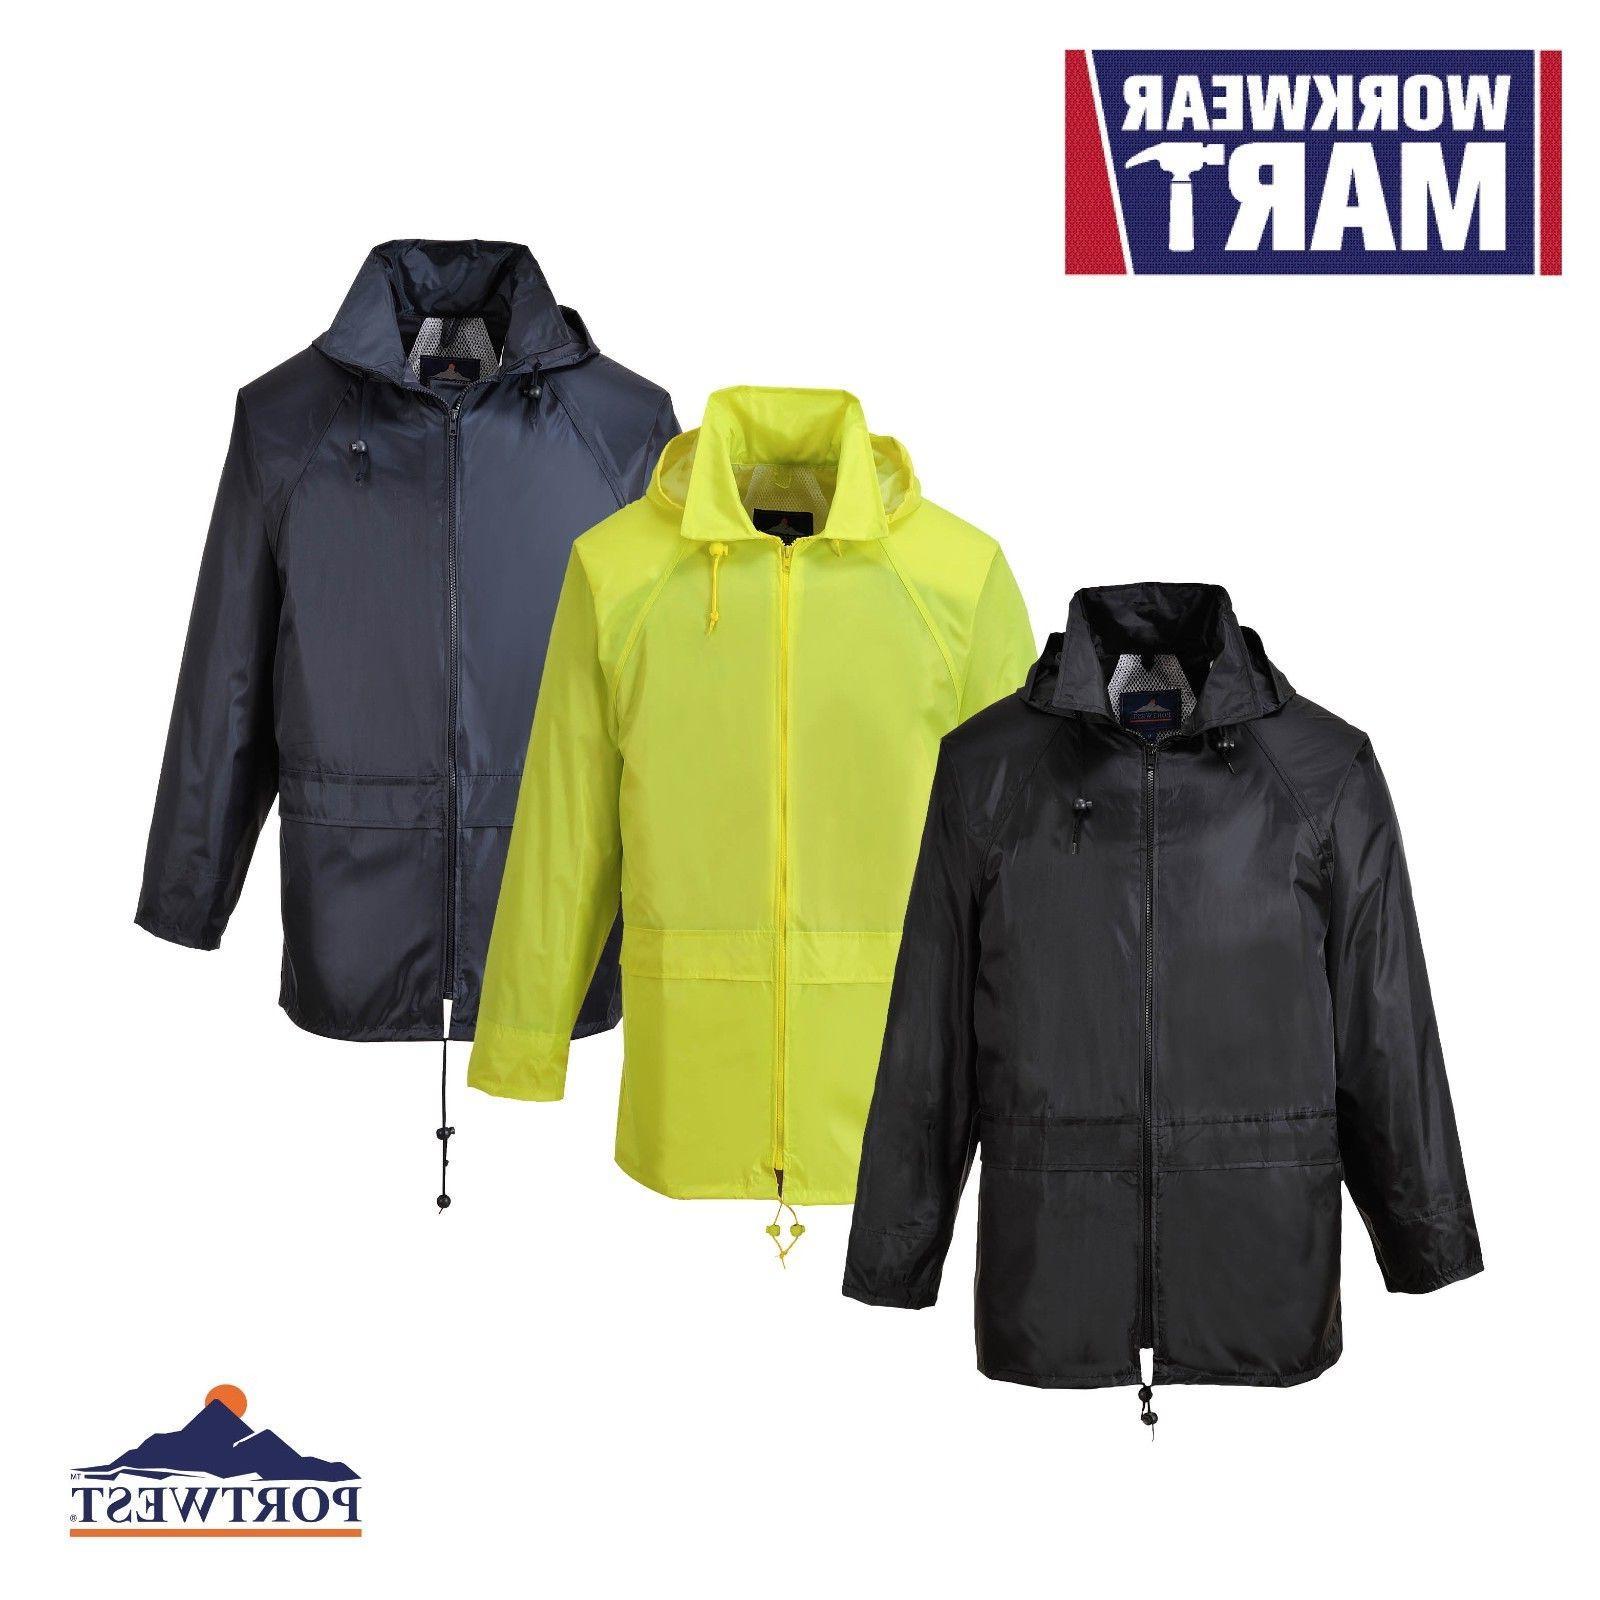 Portwest Classic Rain wth Pack Away Seams